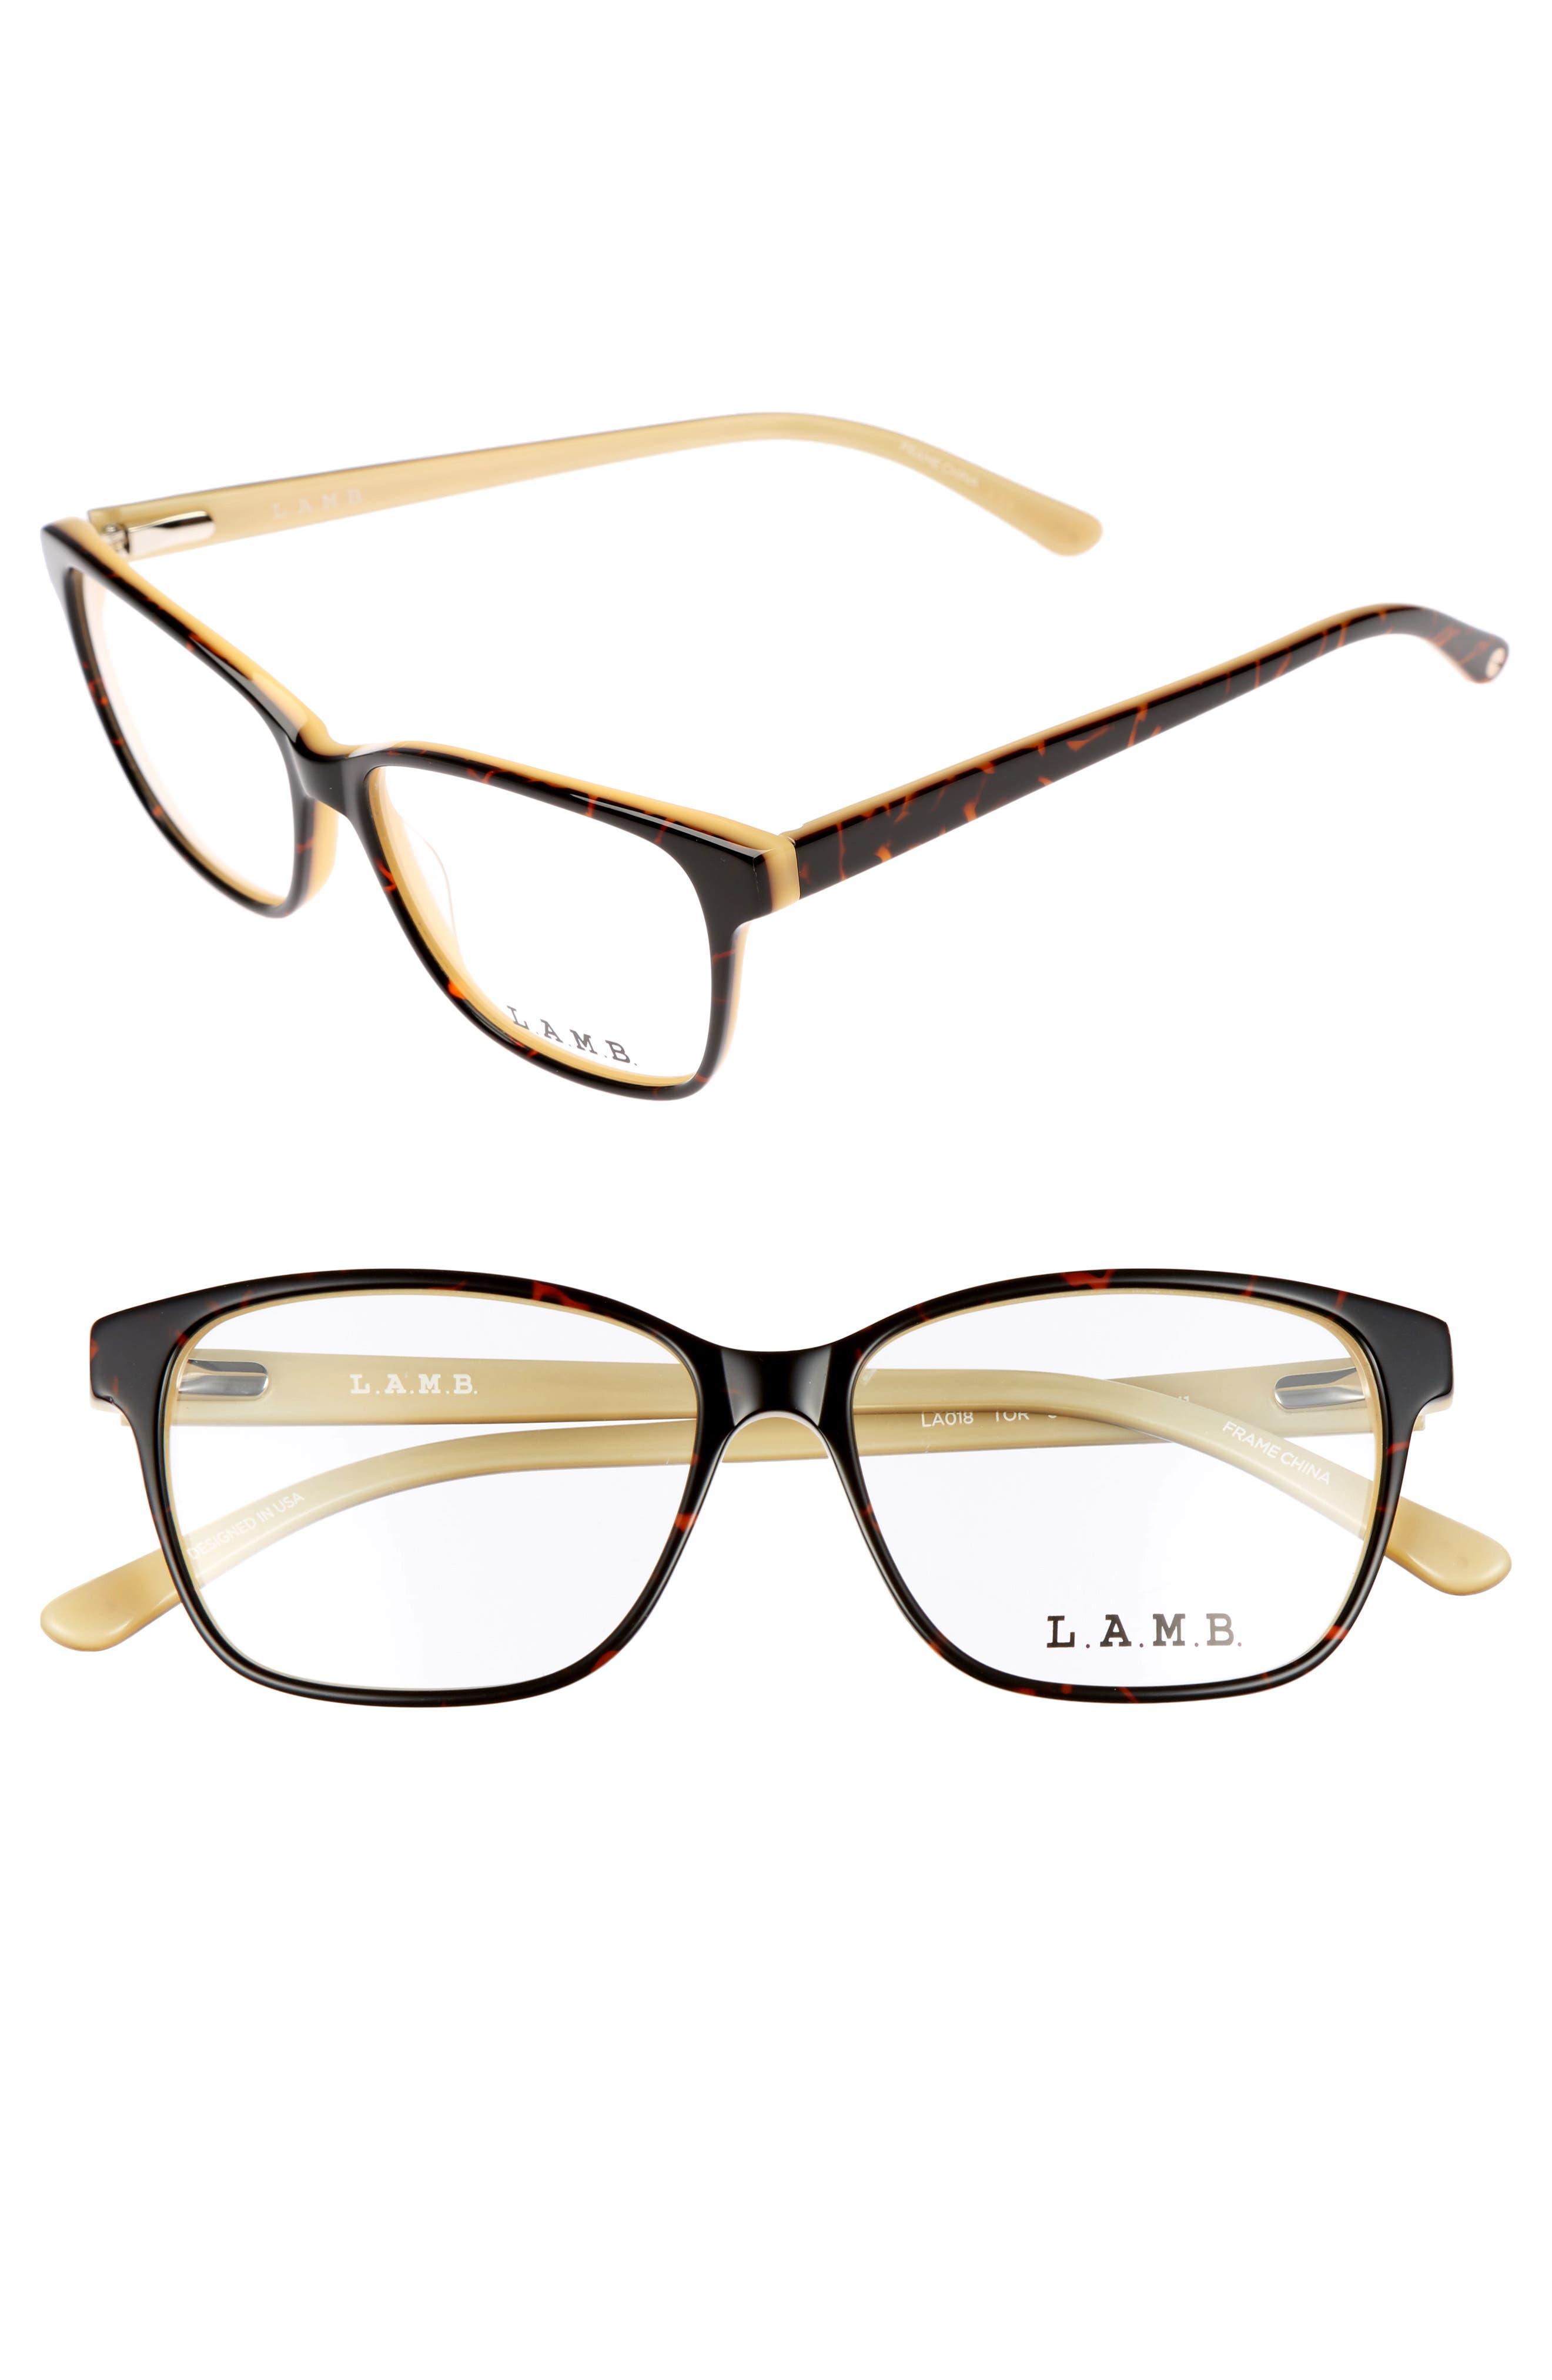 54mm Square Optical Glasses,                             Main thumbnail 2, color,